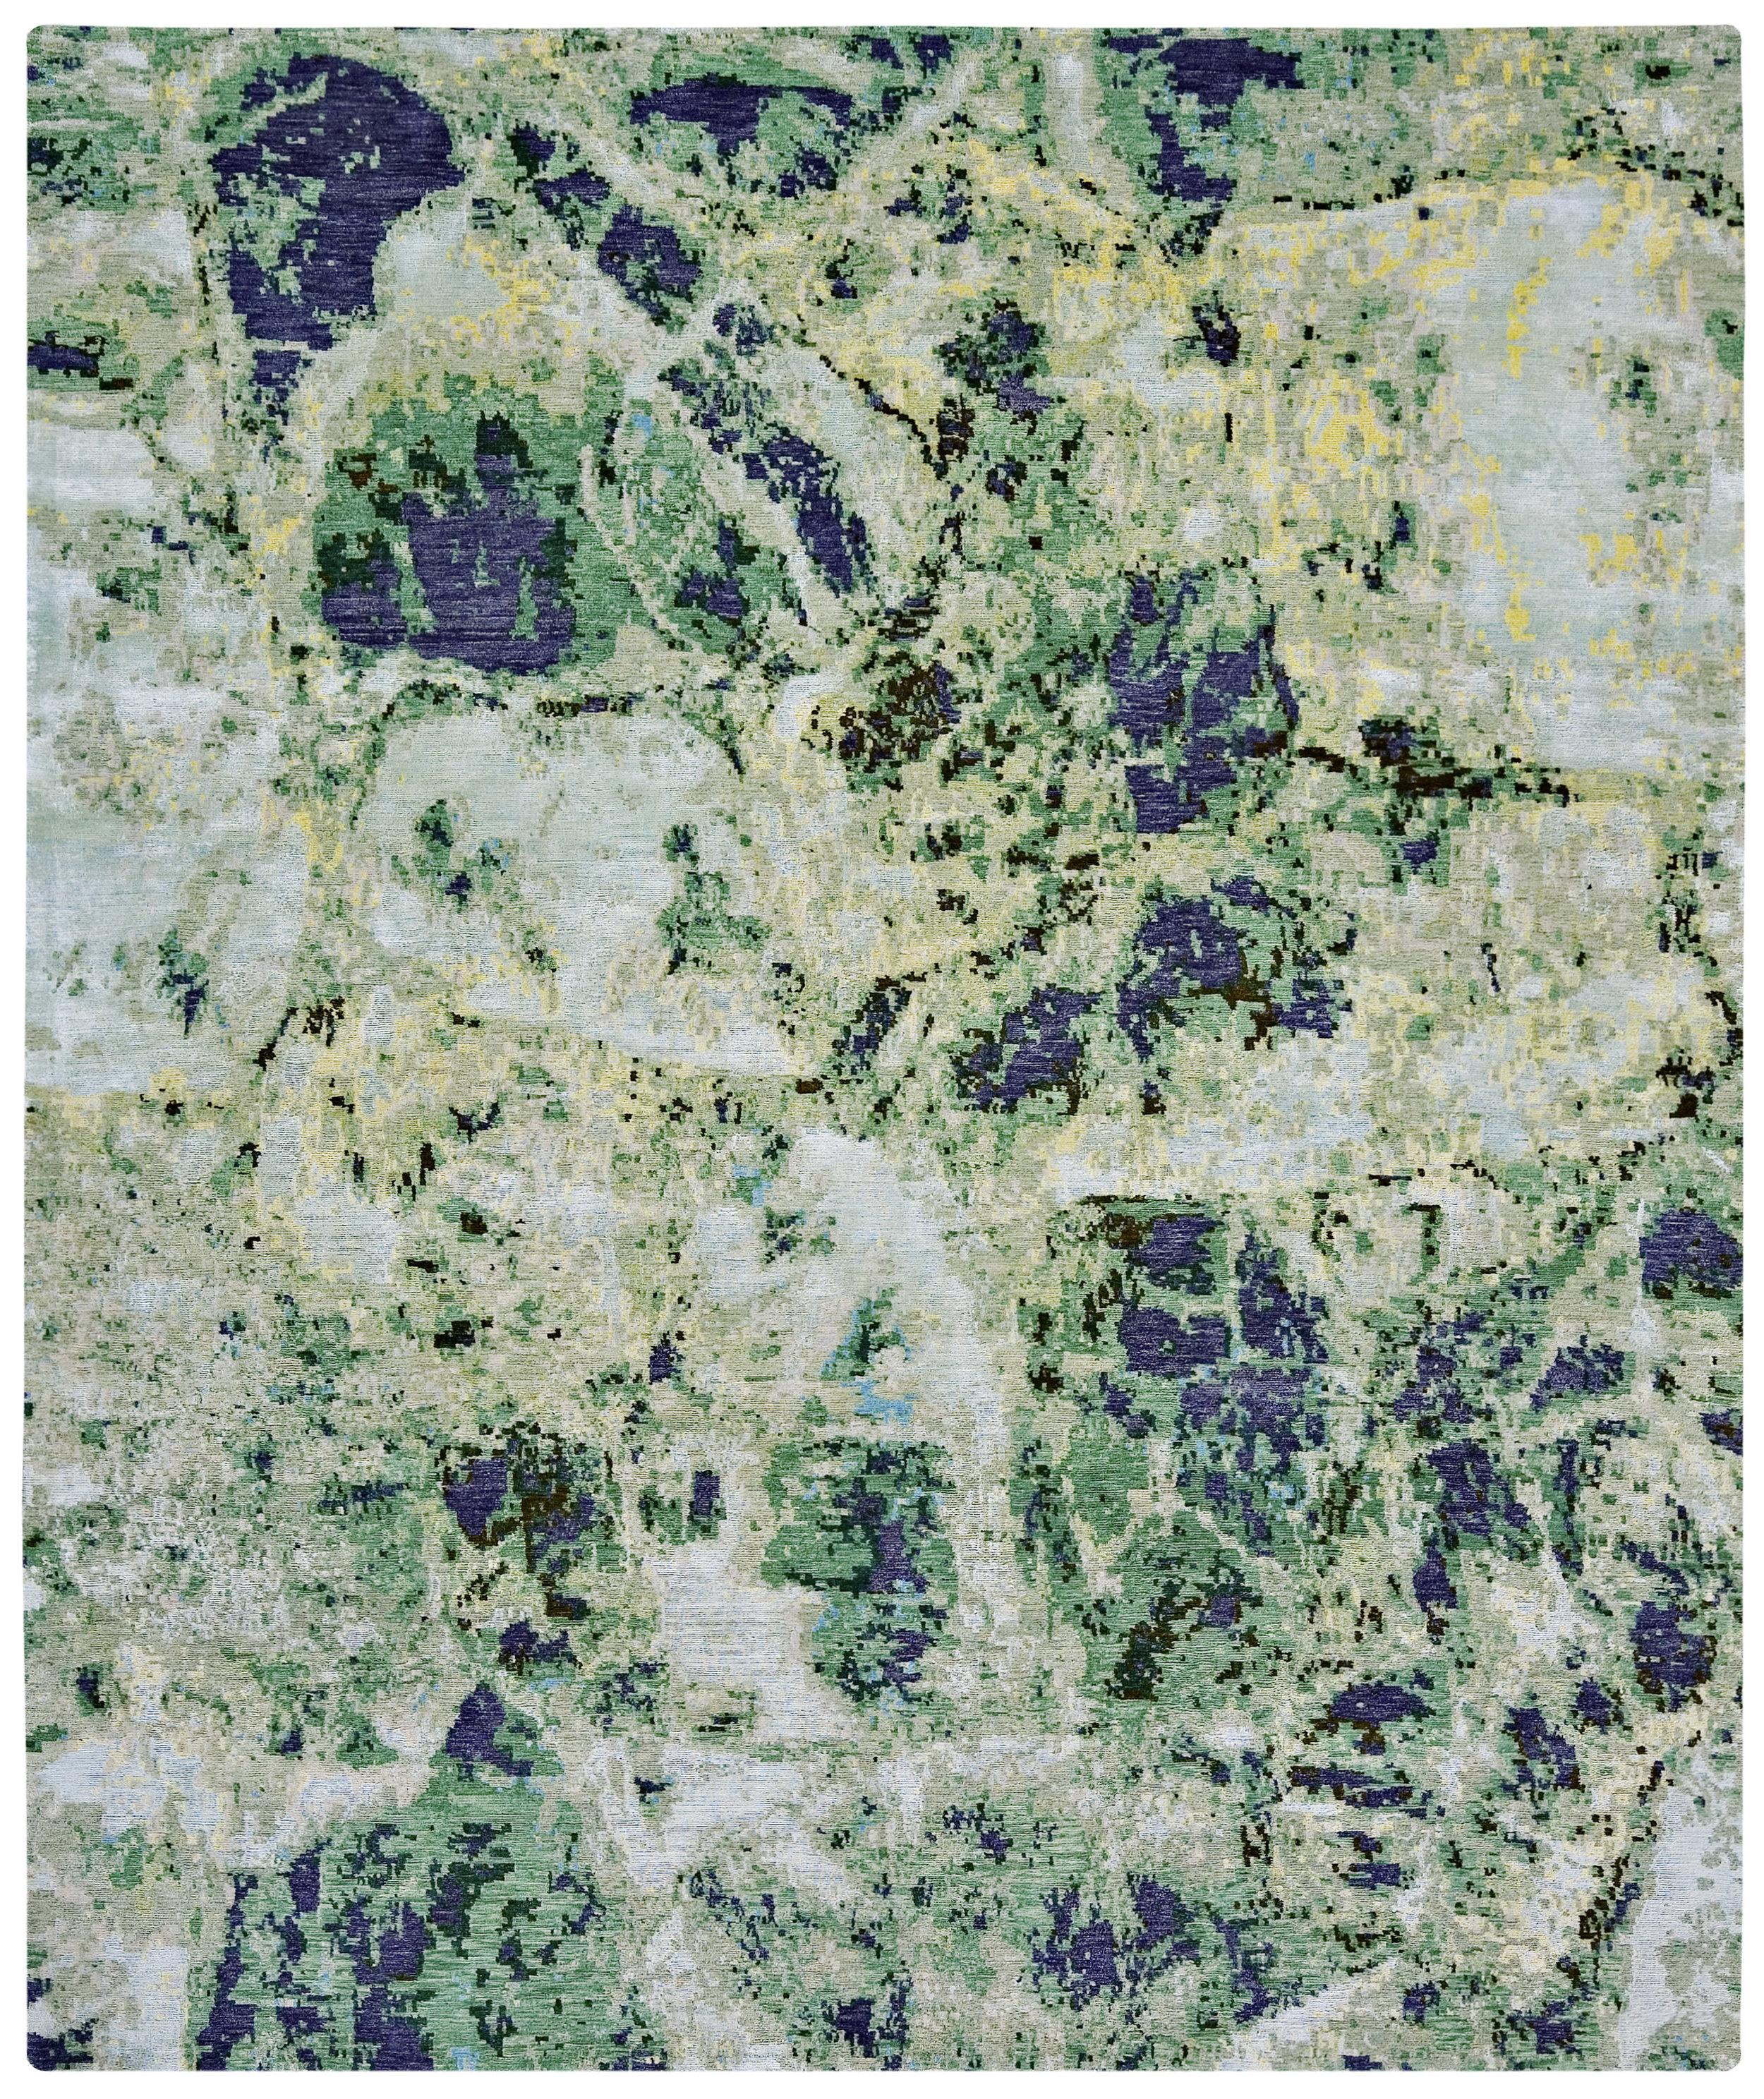 Sliced, Emerald_green, 8x10.jpg